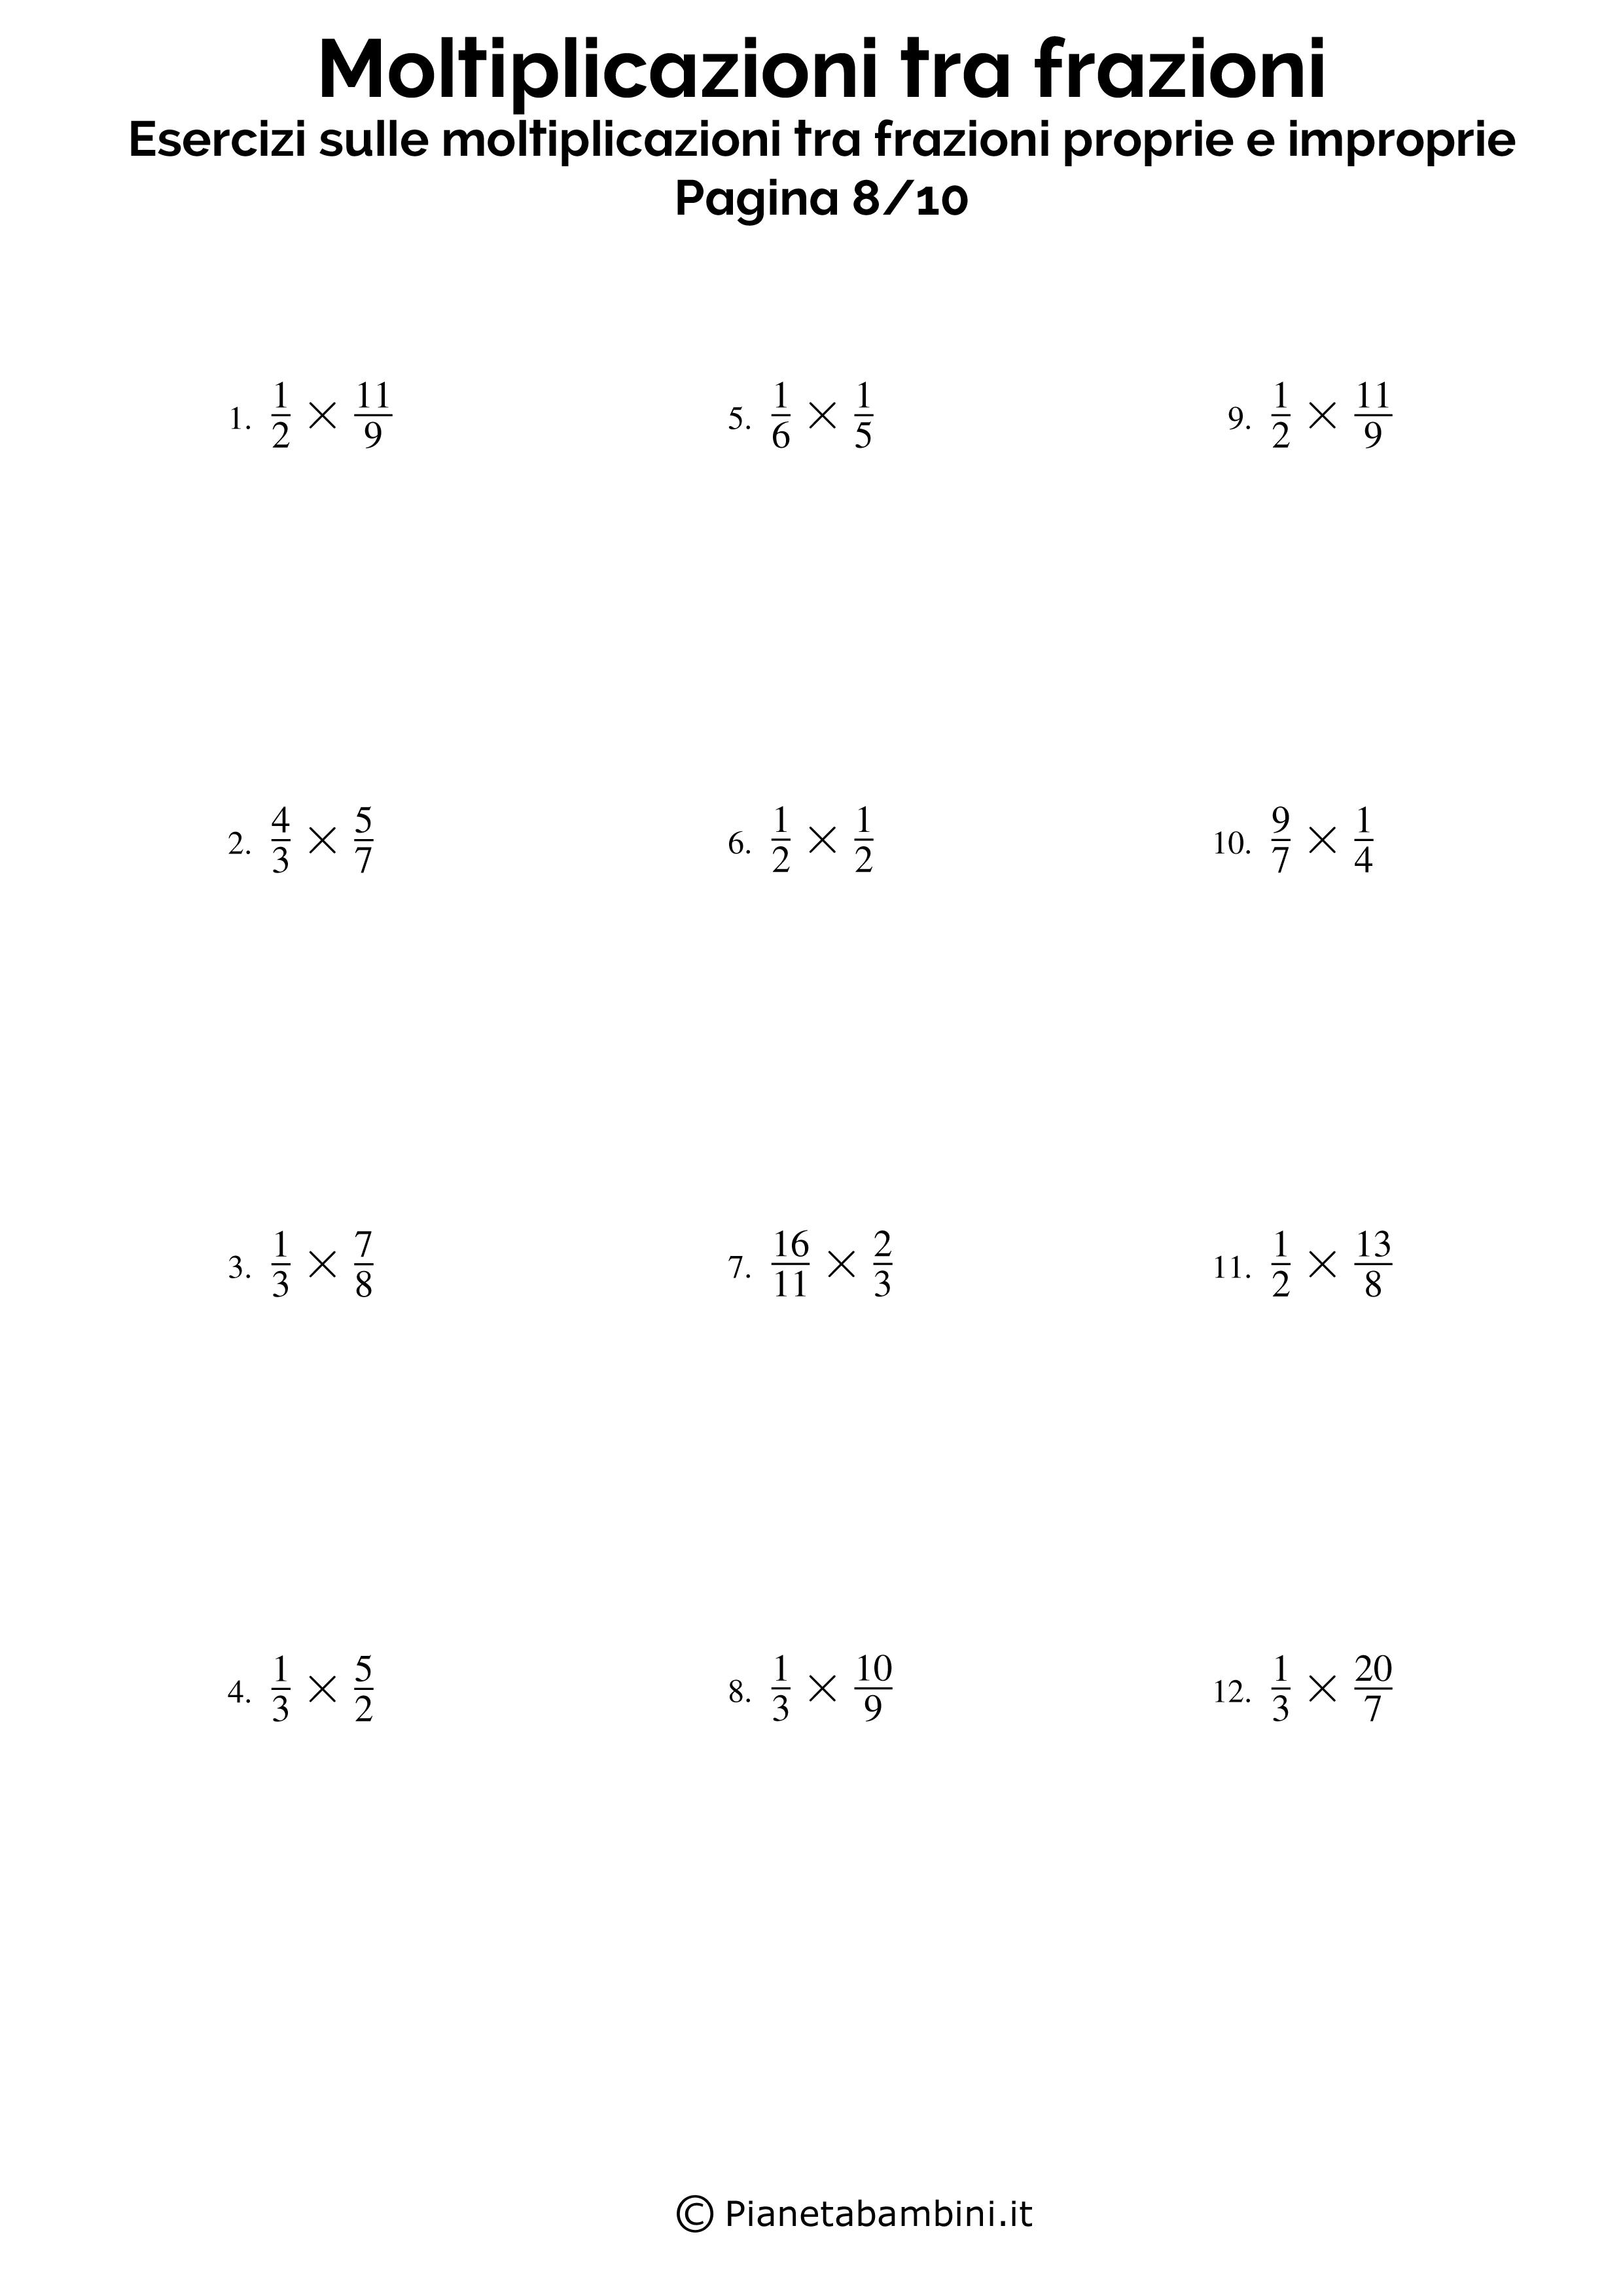 Moltiplicazioni-Frazioni-Proprie-Improprie_08